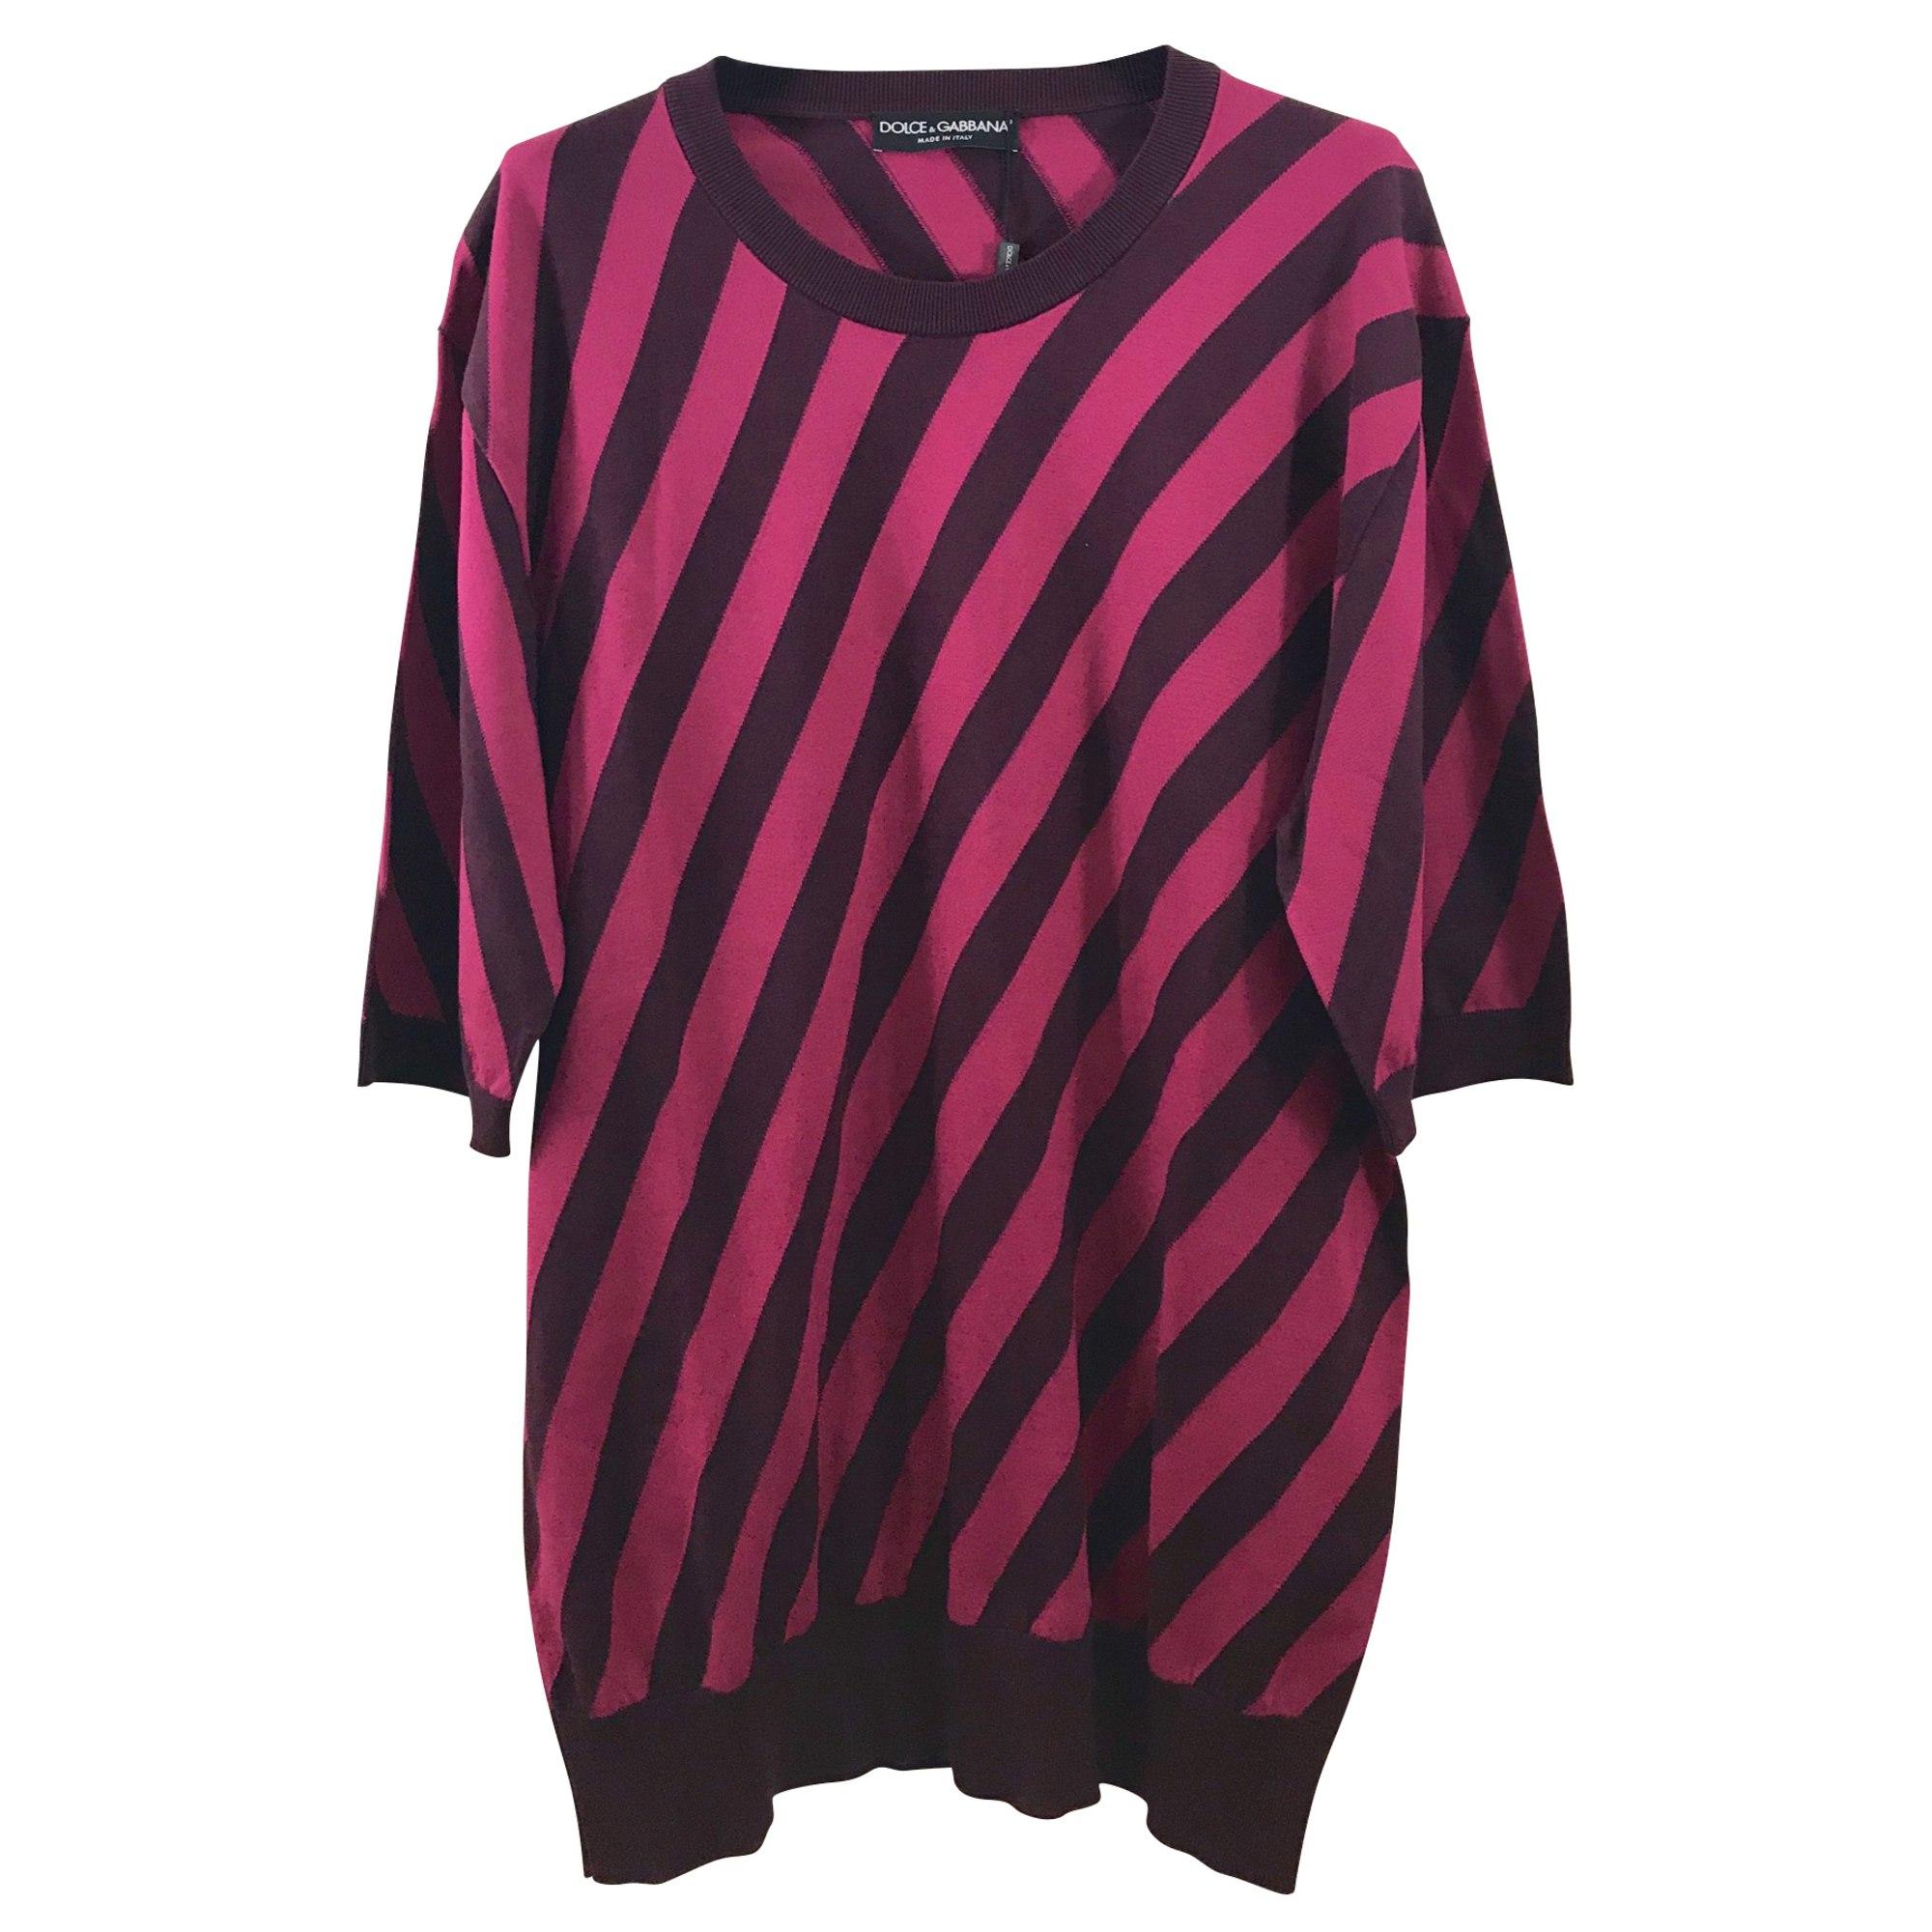 Tee-shirt DOLCE & GABBANA Multicouleur